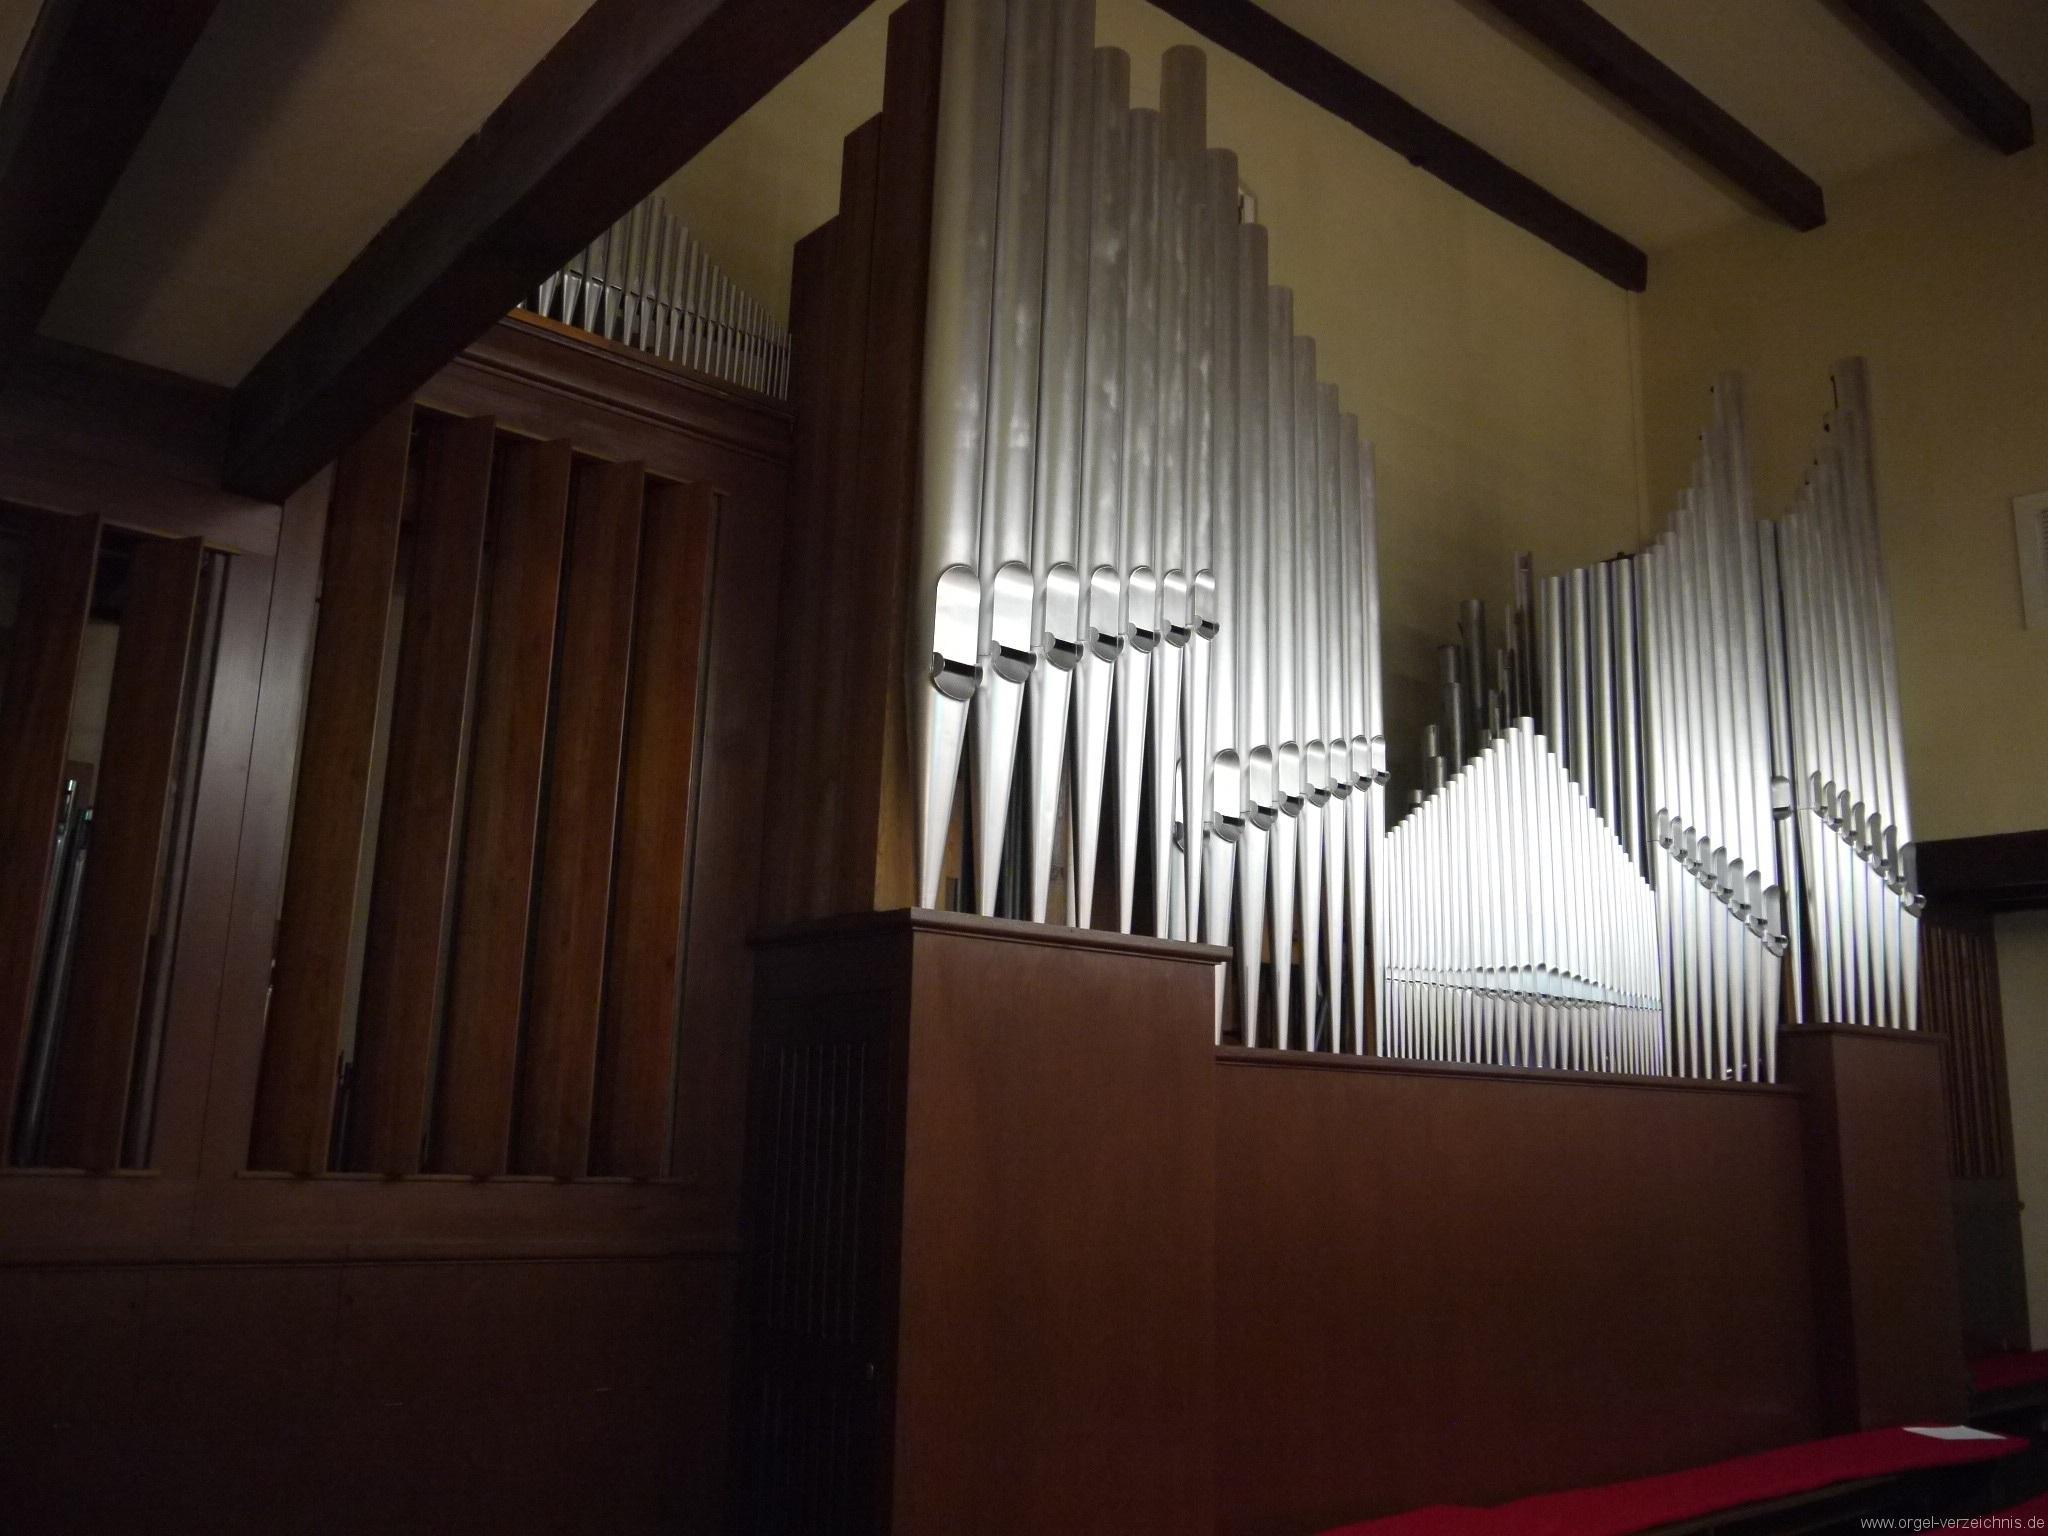 berlin-reinickendorf-hermsdorf-apostel-paulus-kirche-orgelprospekt-ii